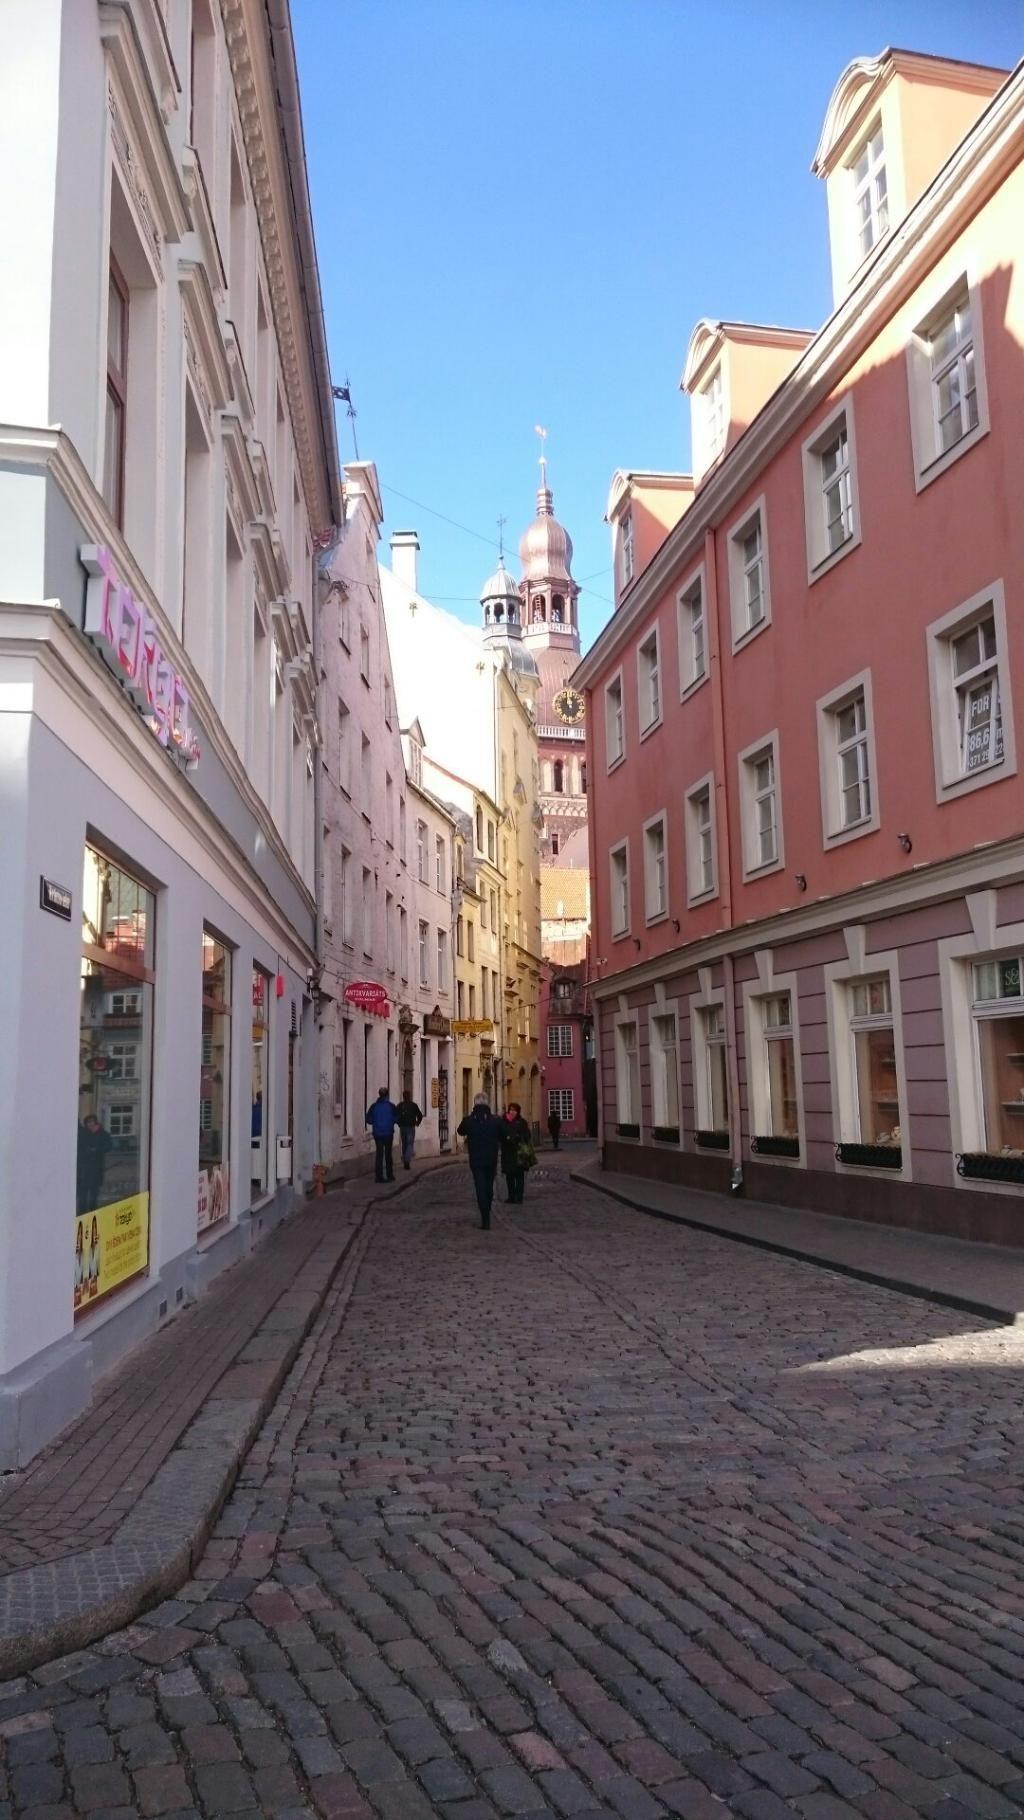 Old City Riga Vecriga Old City Riga Tour Tickets